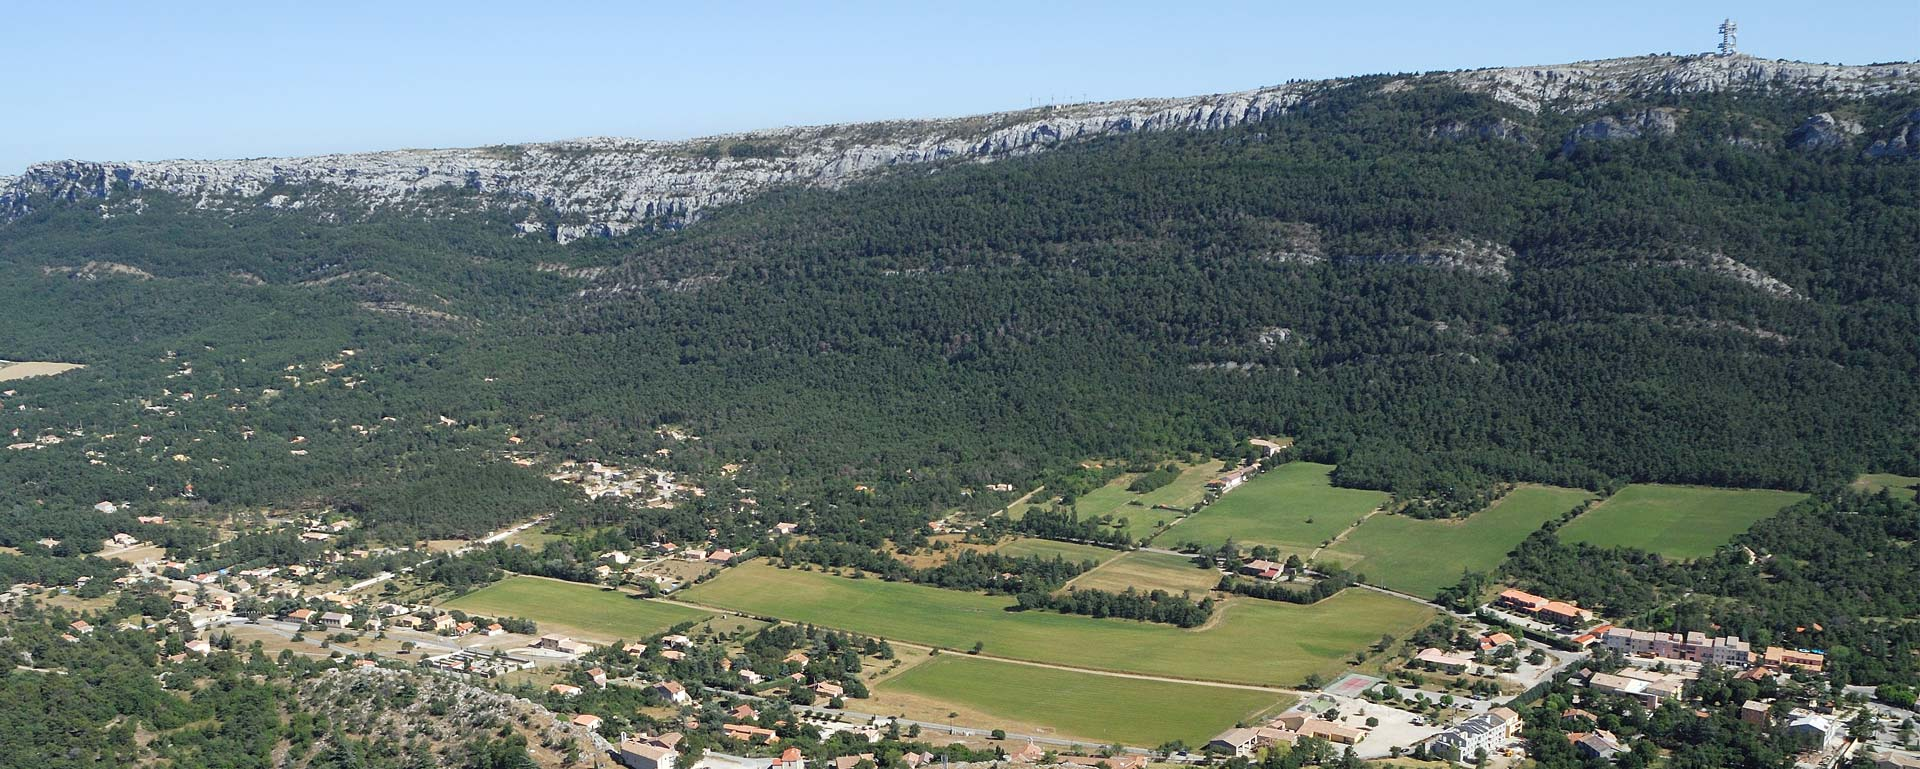 Plan-d'Aups-Sainte-Baume